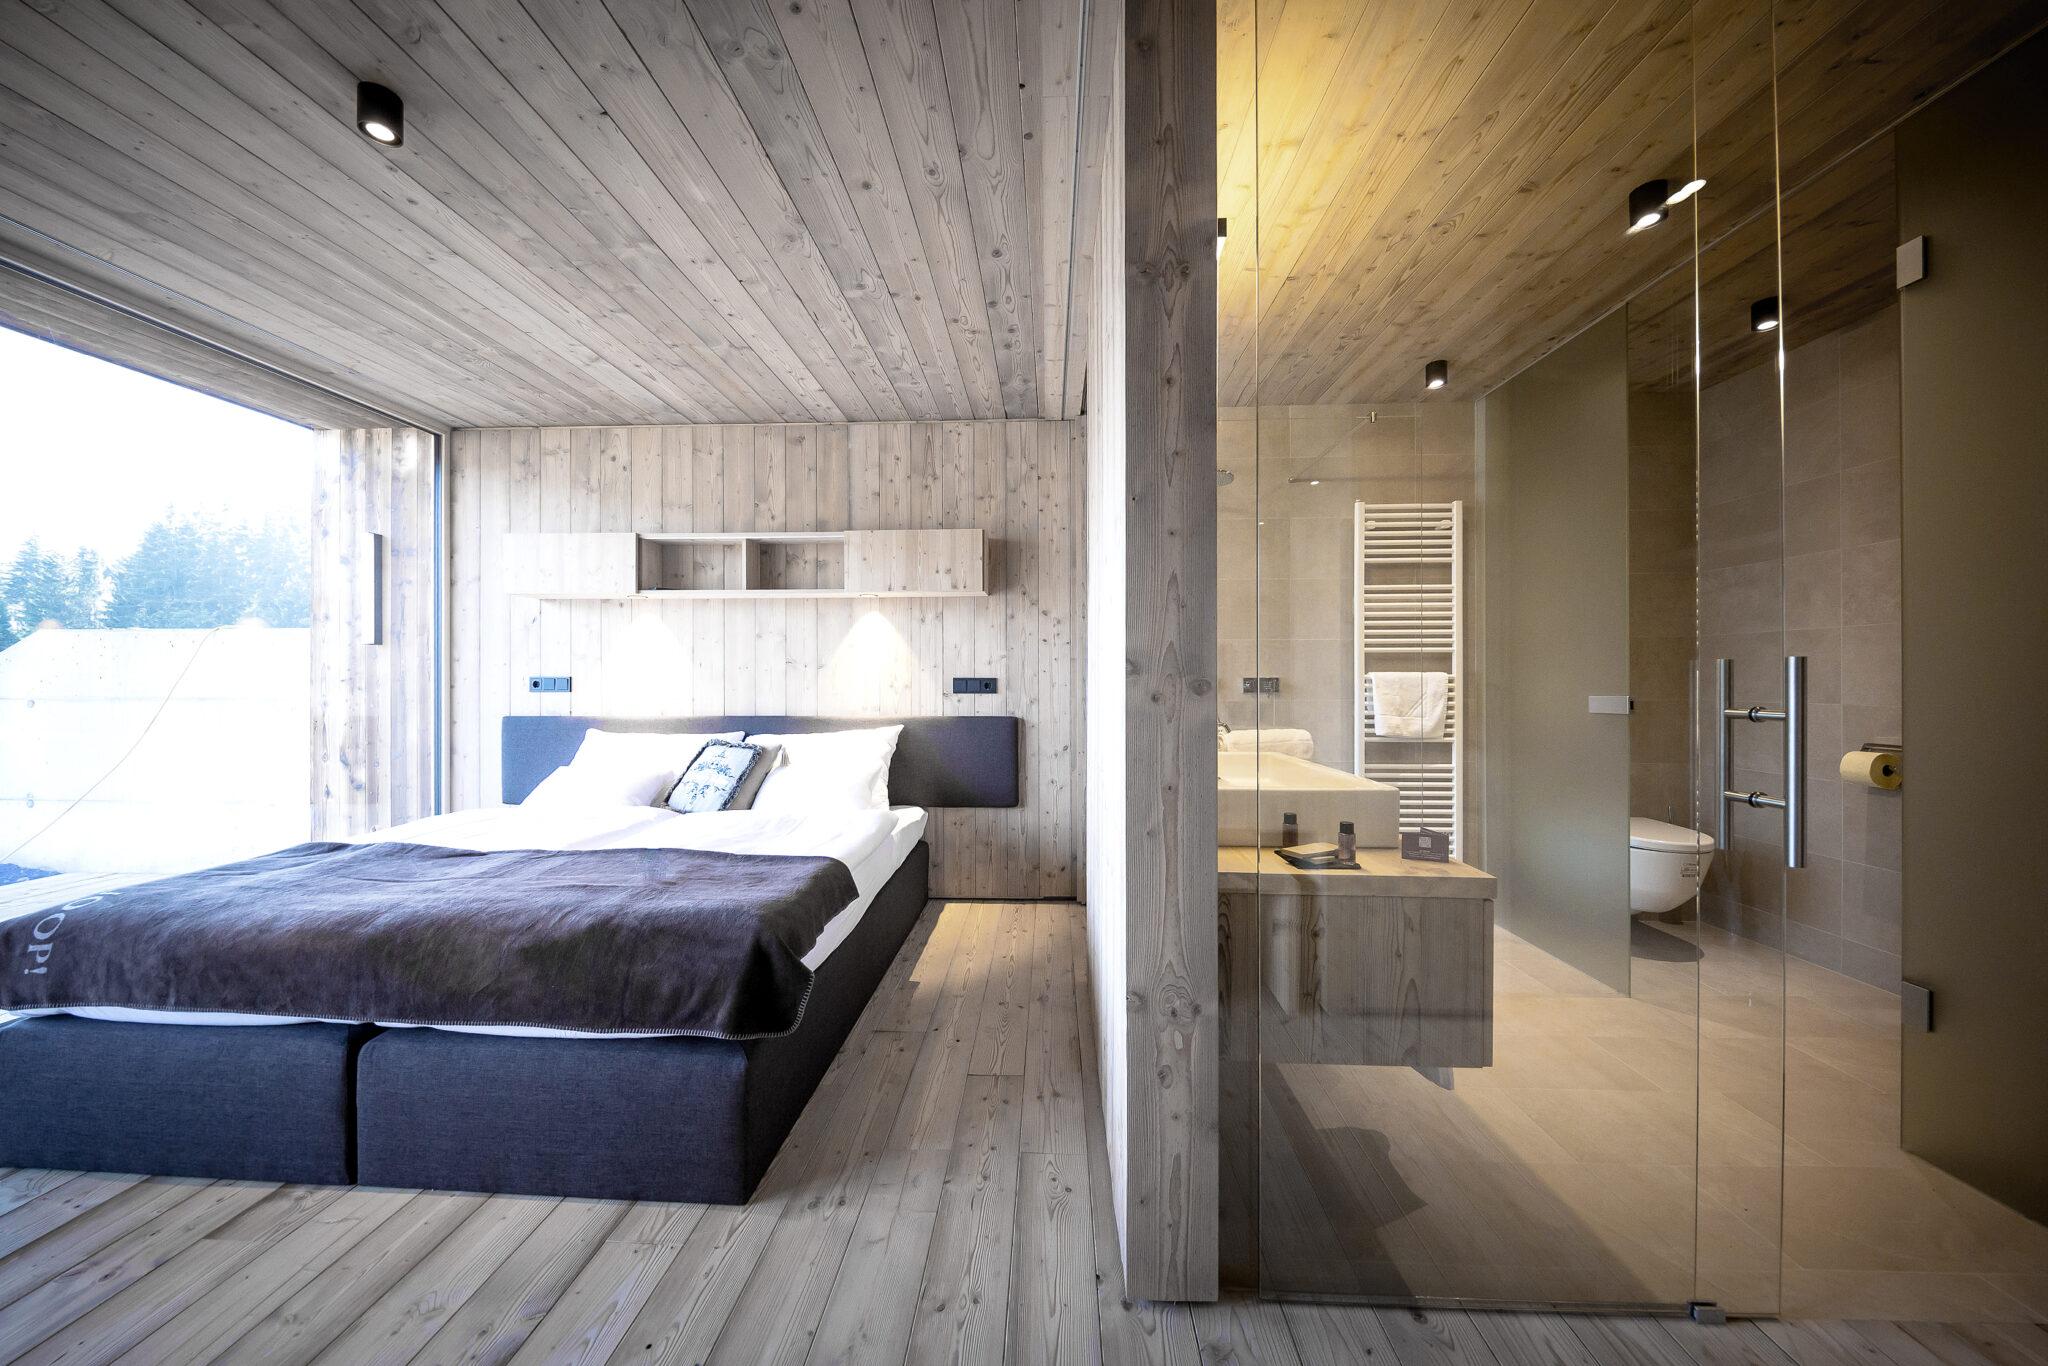 4J0A1674DasWiesegg_ApartmentStadl_bybecknaphoto2015